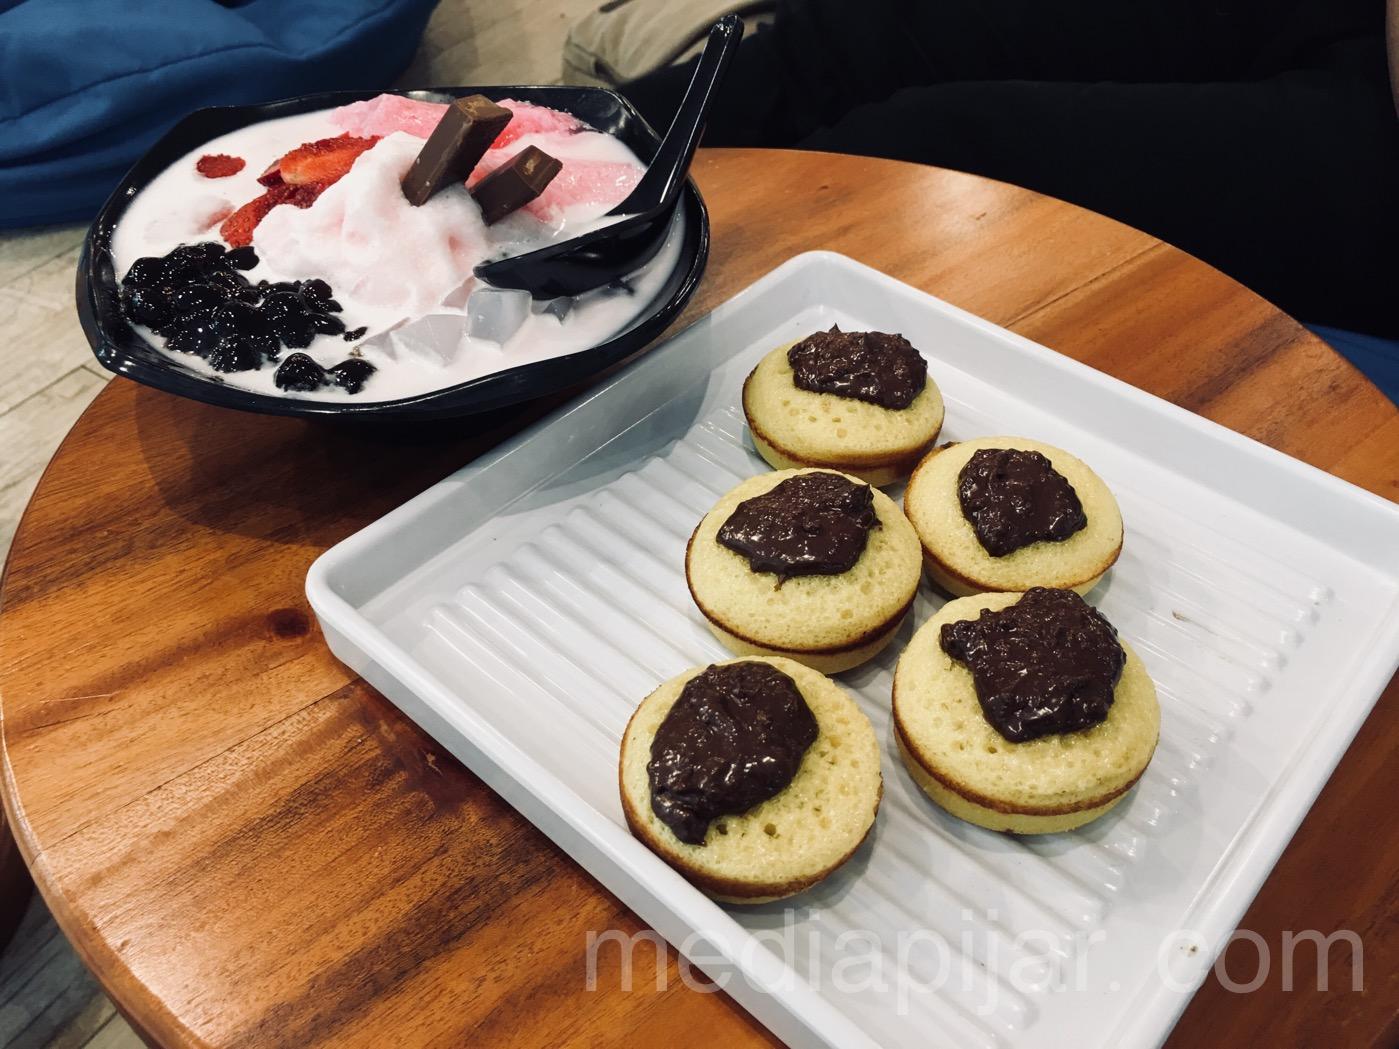 Kue Cubit dan Strawberry Fun Ice, cocok disantap sambil bersantai di Warung Kudeta yang ditawarkan dengan harga terangkau. (Fotografer: Frans Dicky Naibaho)